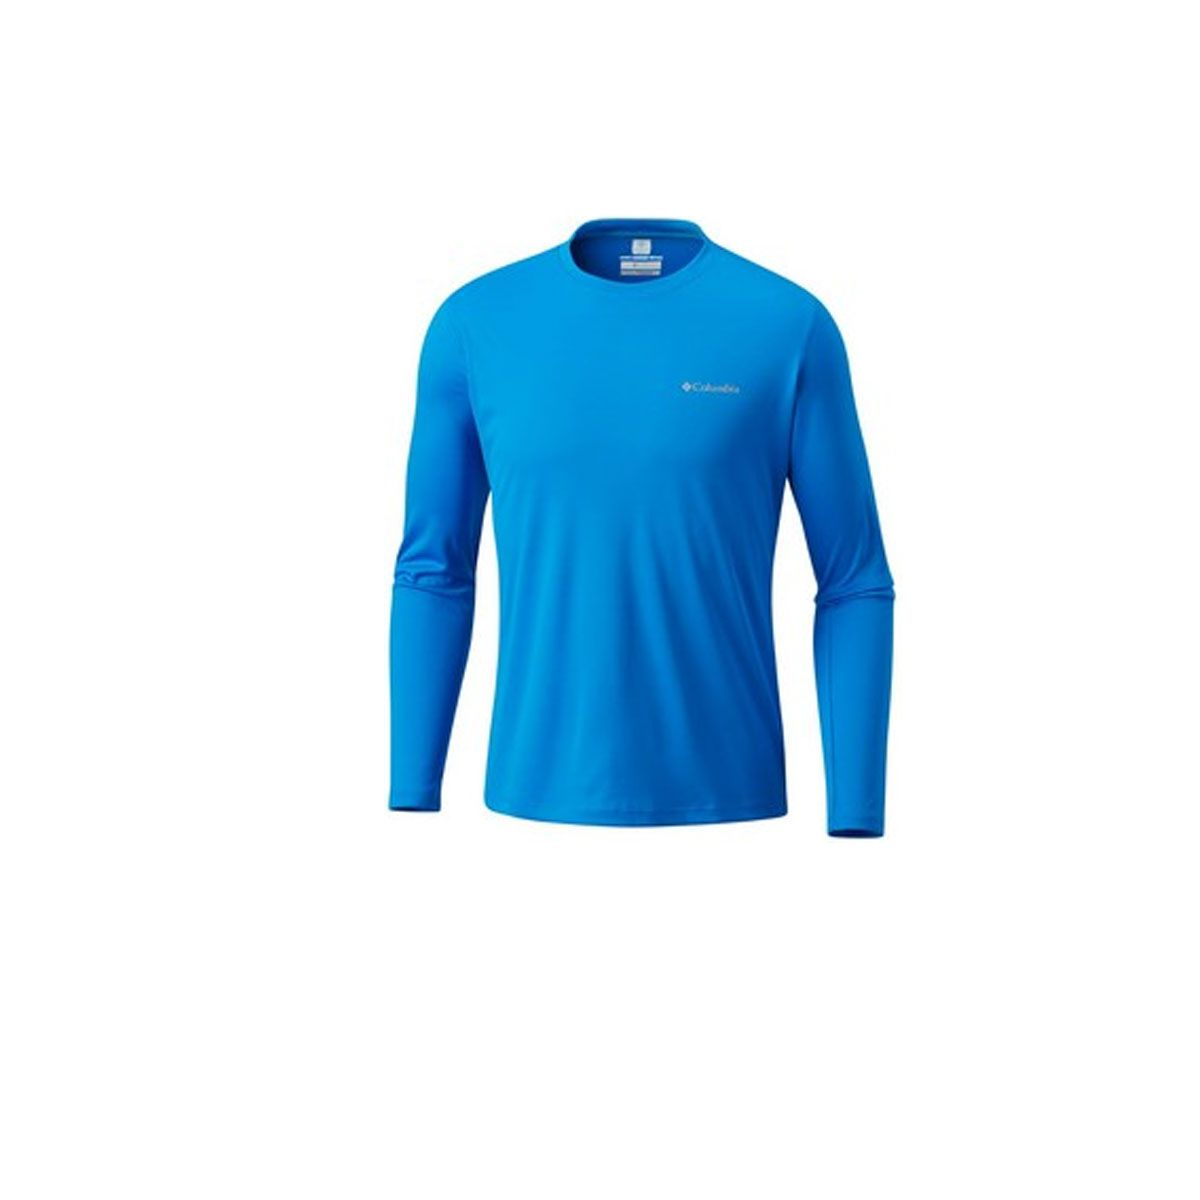 Camiseta Zero Rules Long Sleeve Shirt Hyper Blue